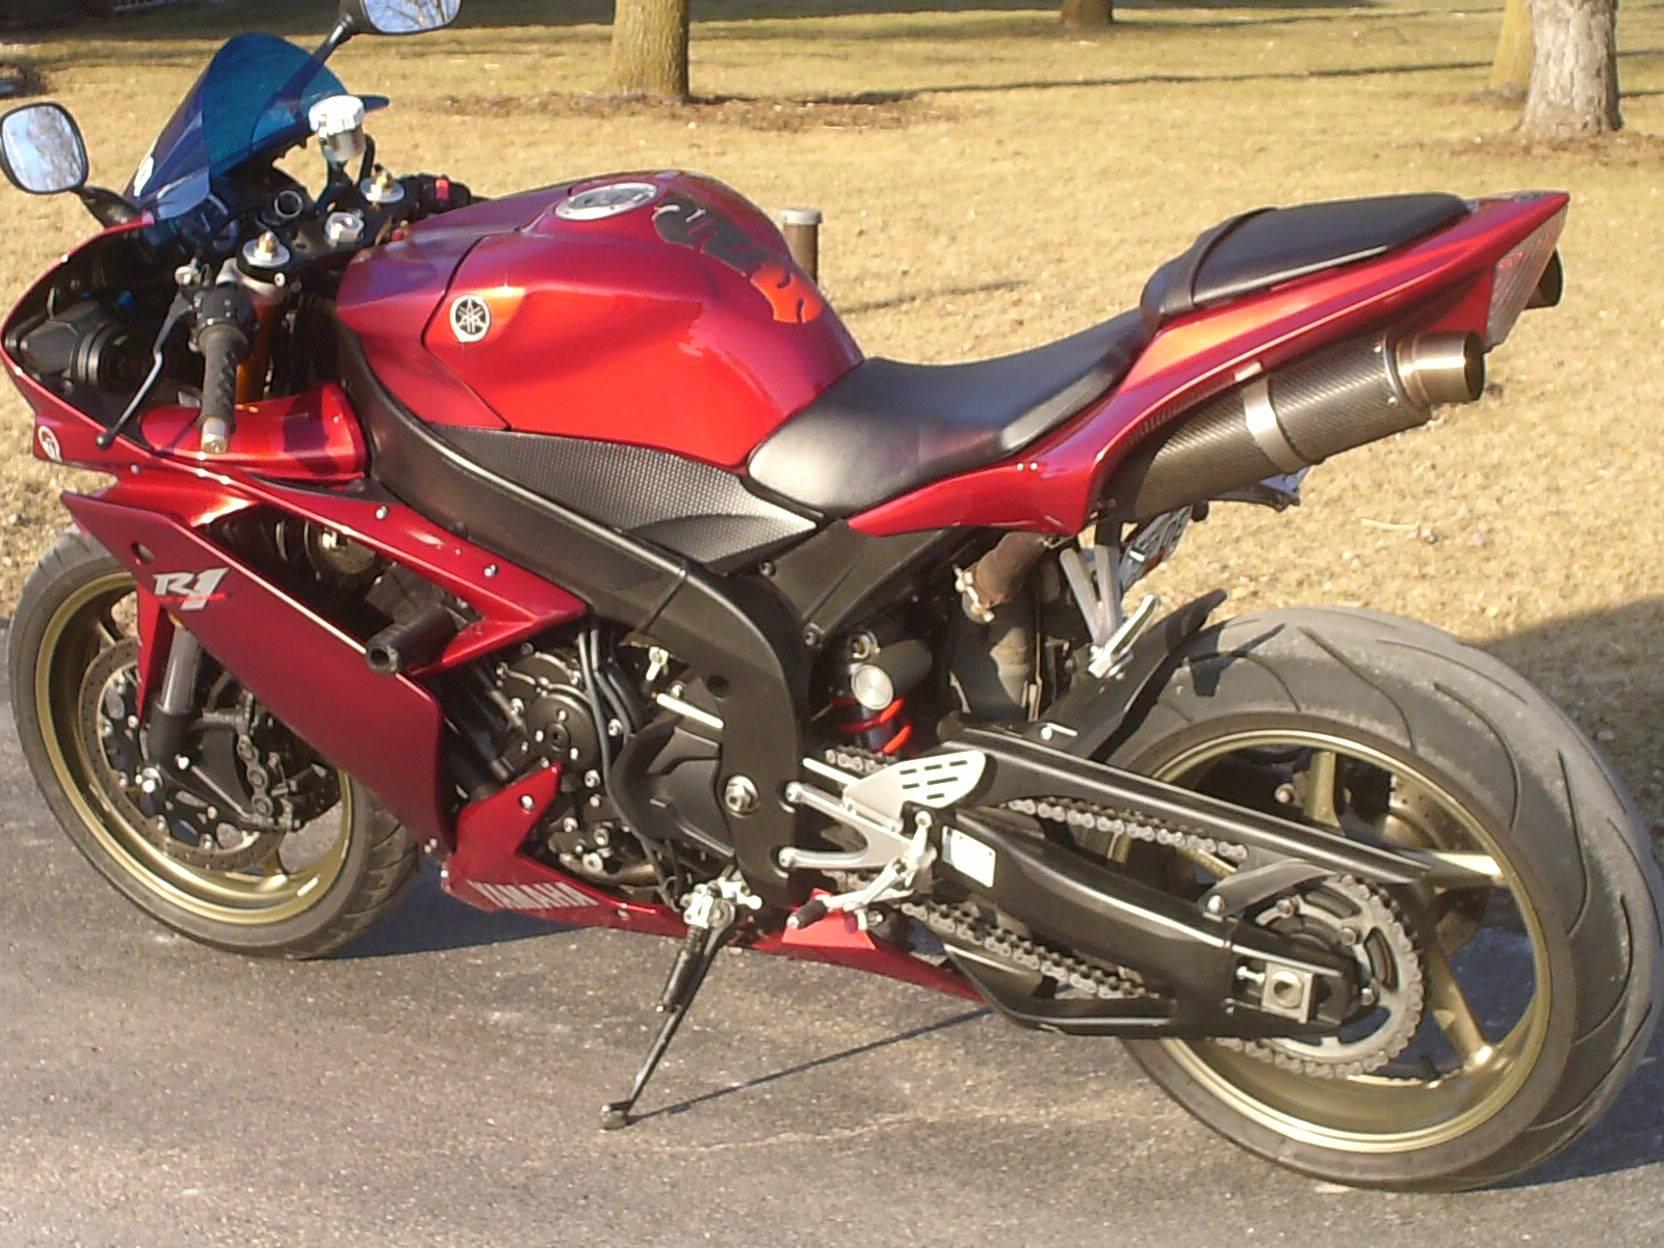 2008 Yamaha YZF-R1 4